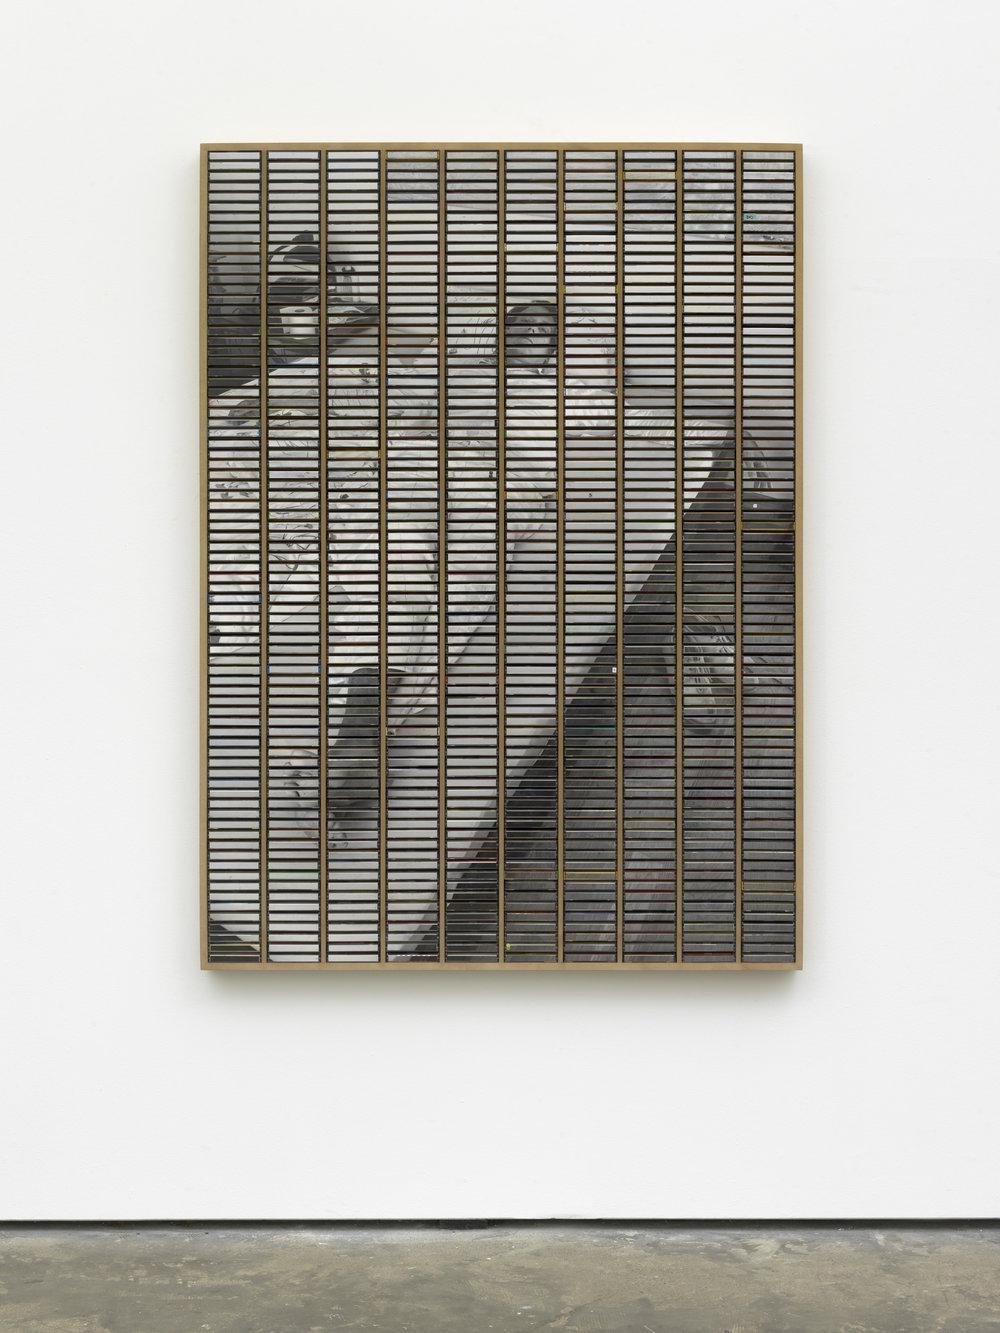 "GH/M 1121/KSK, Gregor Hildebrandt  ""Im Zimmer die Decke betrachtend"", 2018 170 x 125 cm / 67 x 49 1/4 in ink jet print and plastic boxes in wooden case"